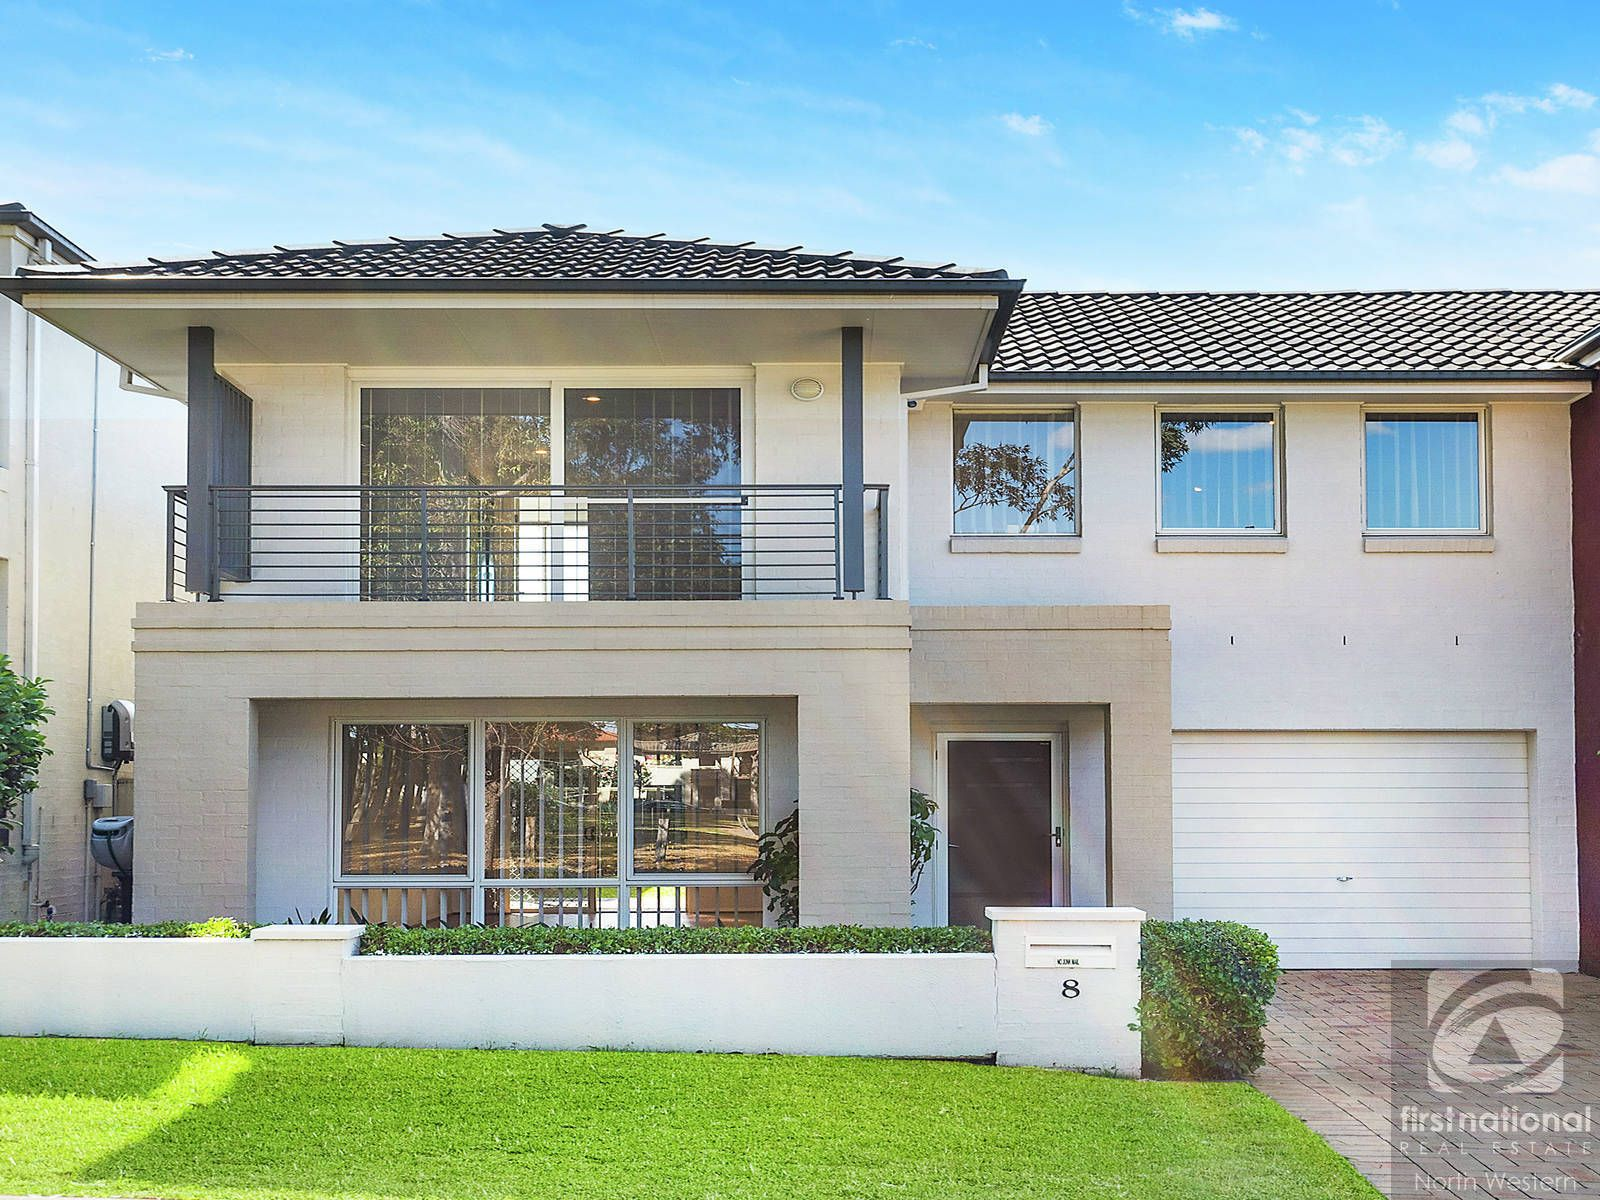 8 Eccles Way, Stanhope Gardens, NSW 2768